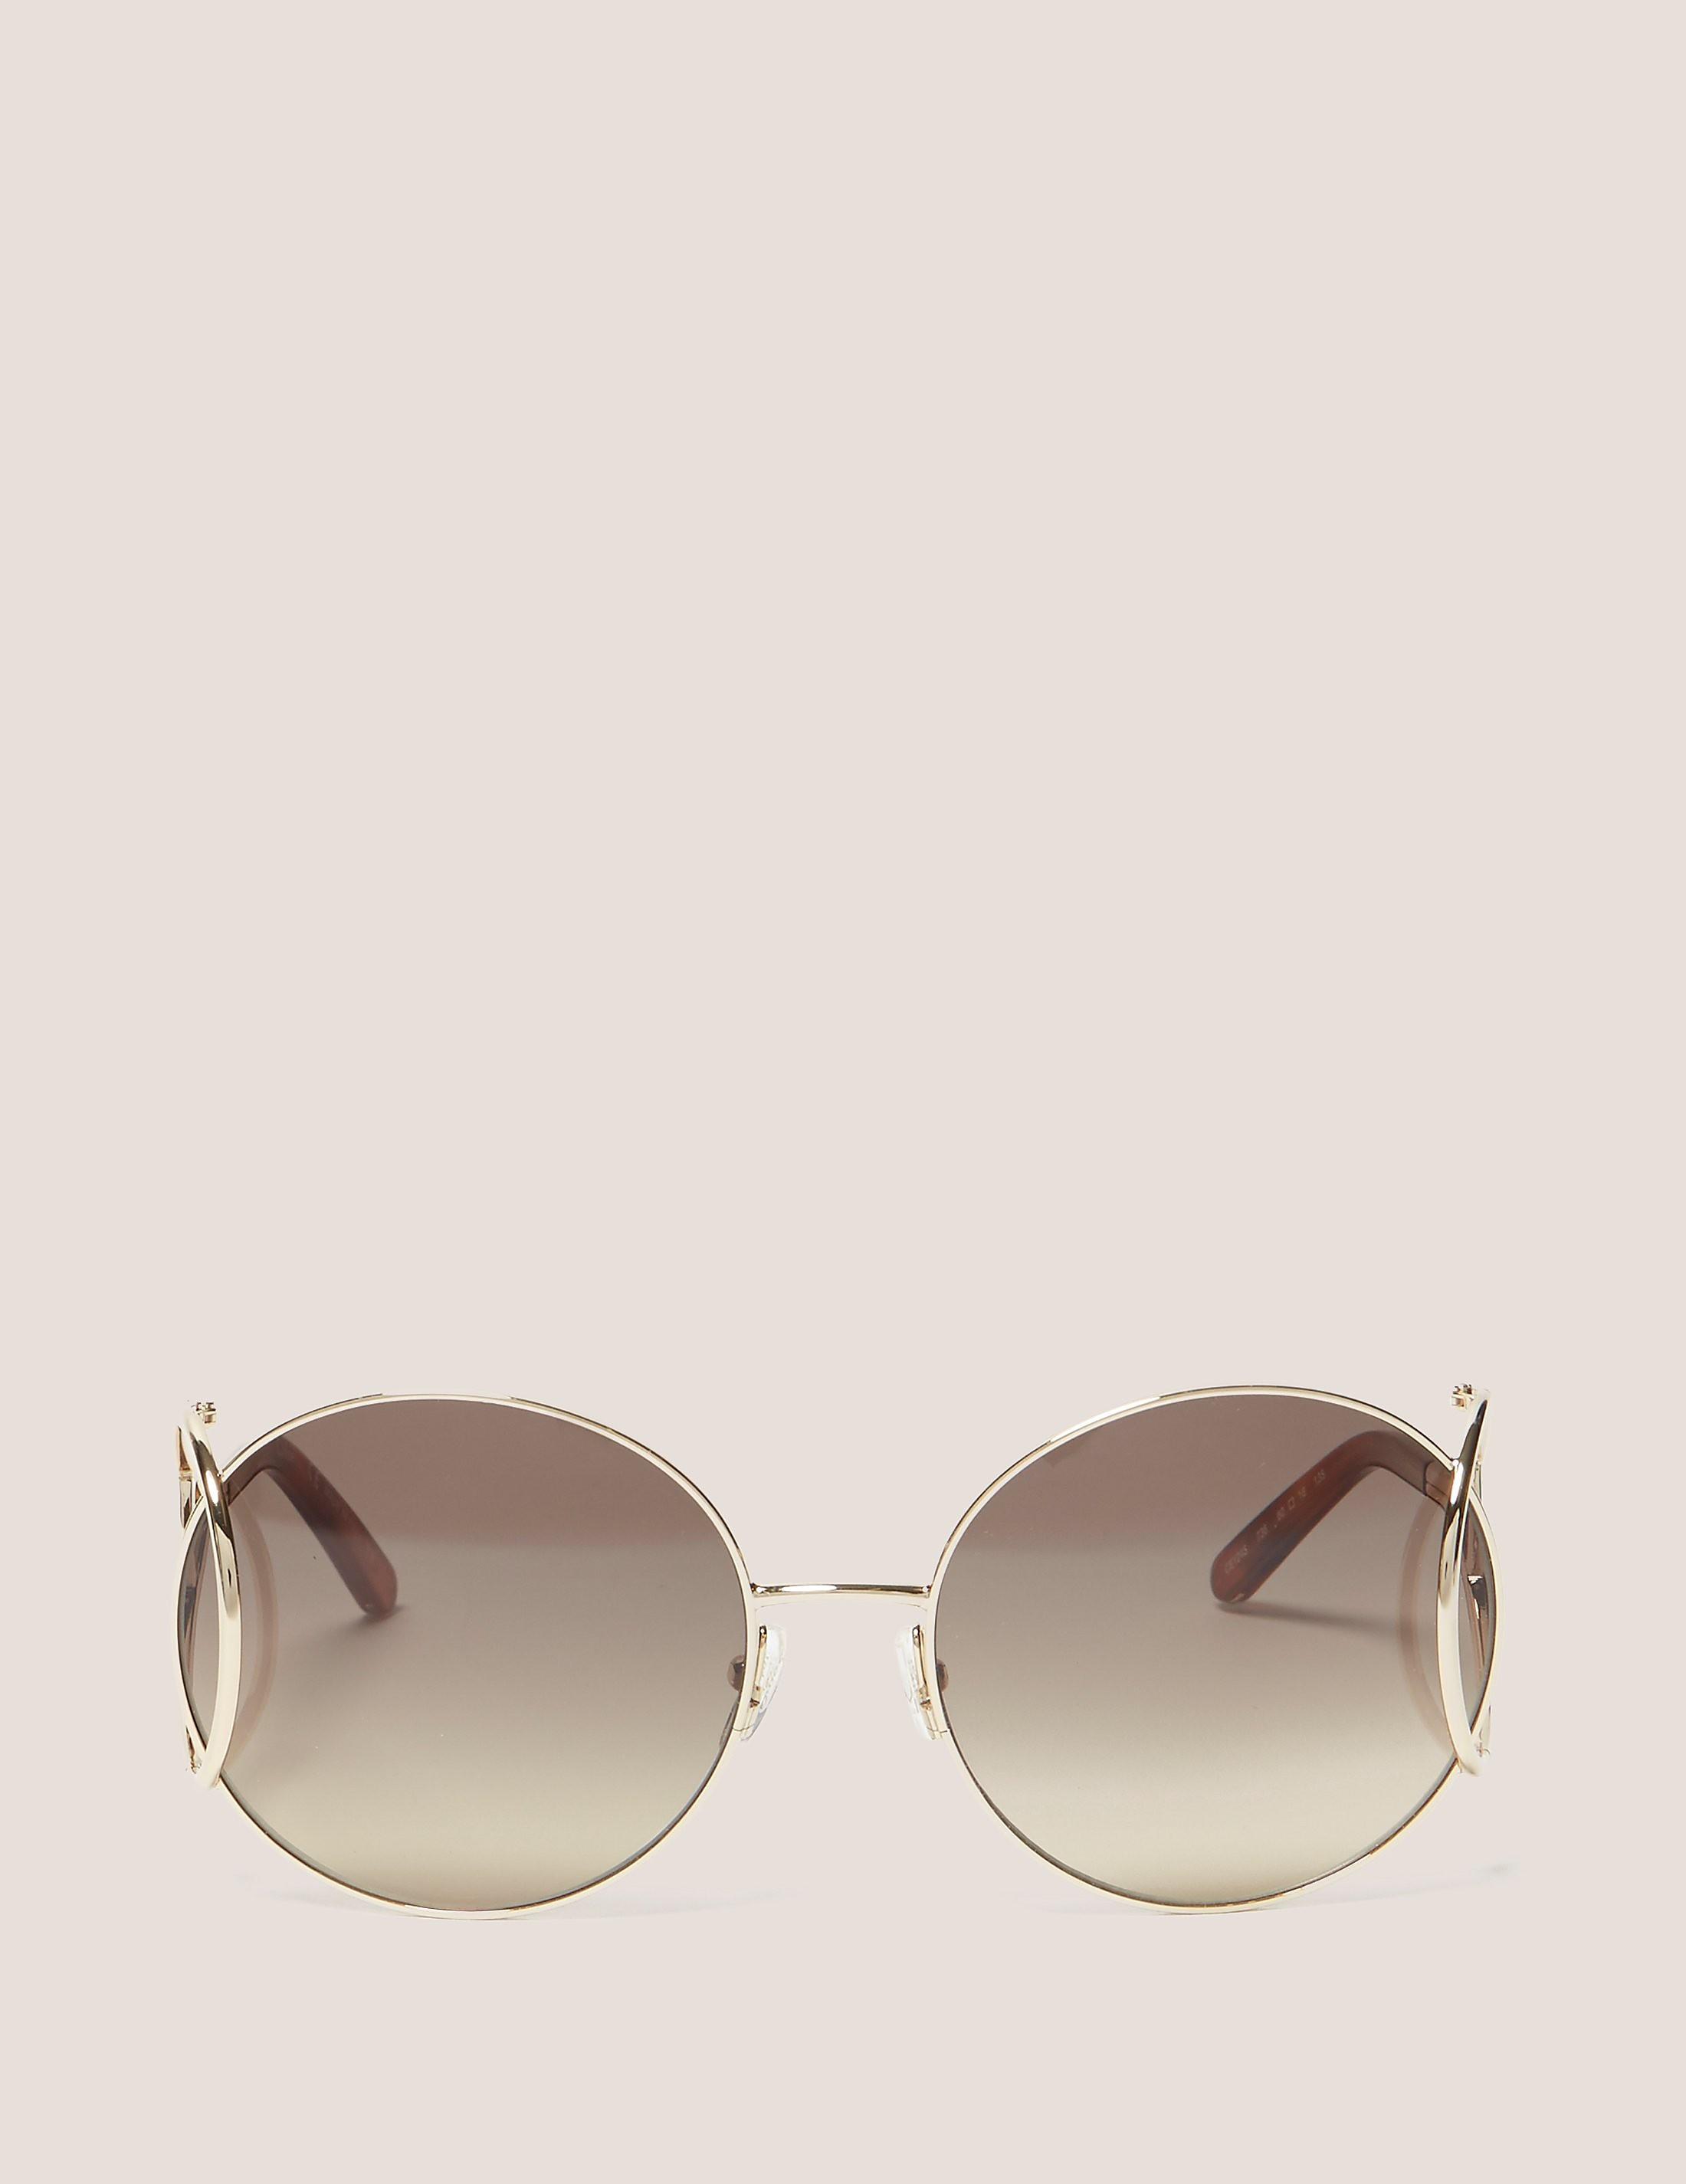 Chloe Jackson Sunglasses